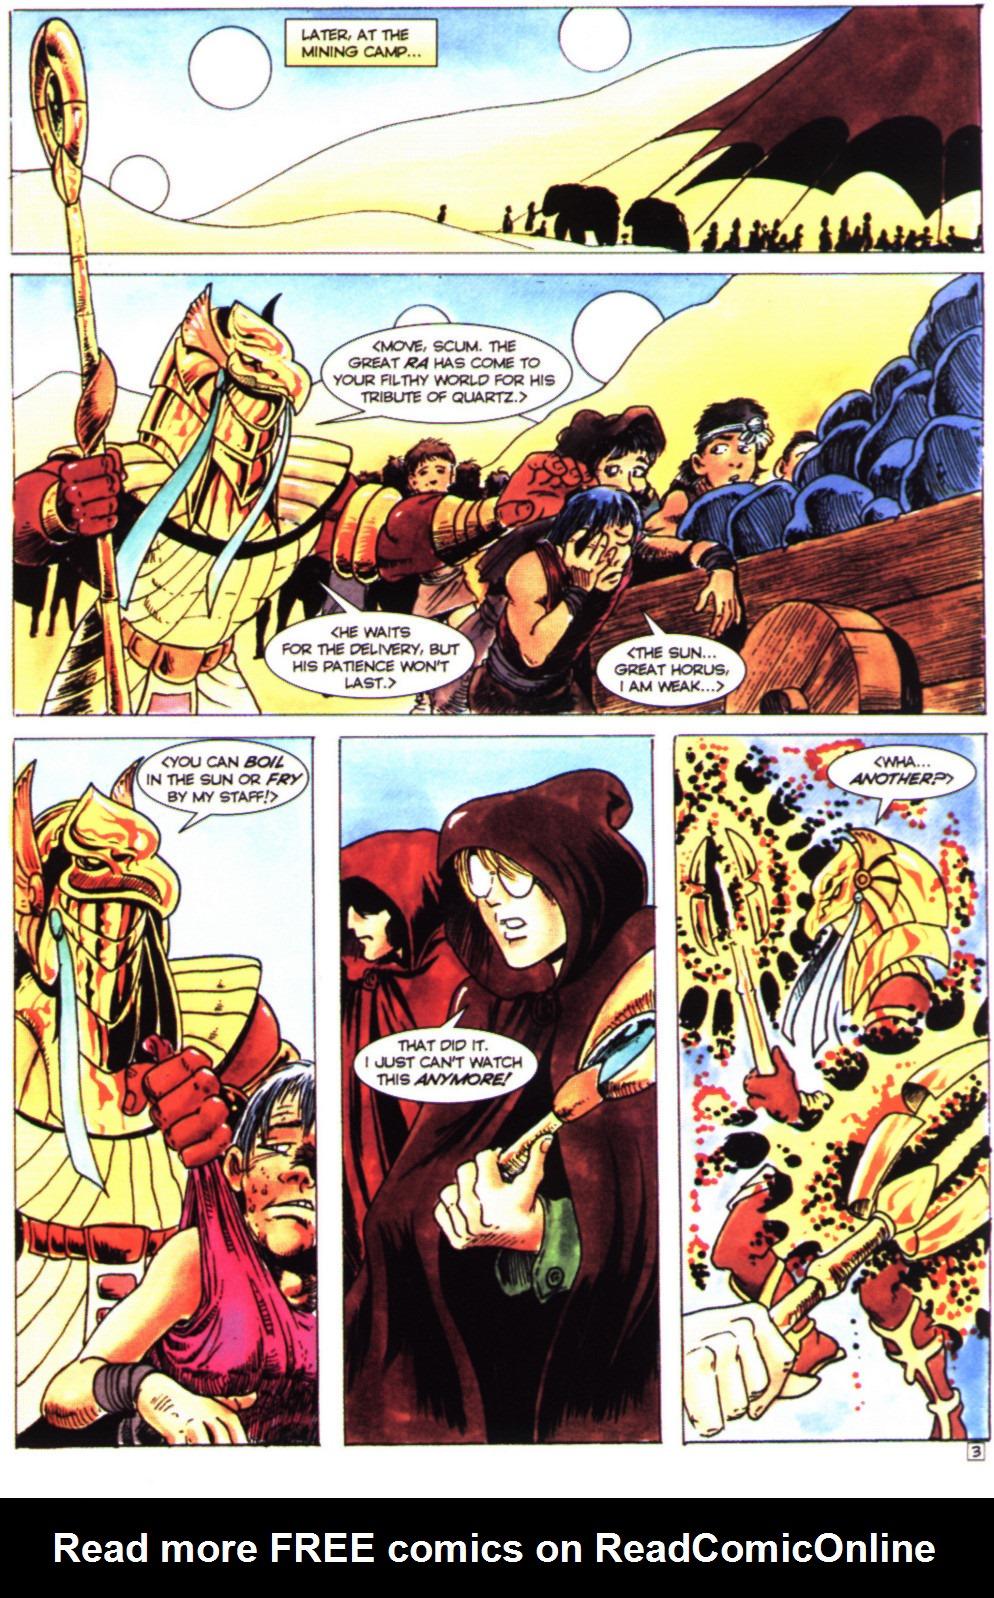 Read online Stargate comic -  Issue #4 - 5